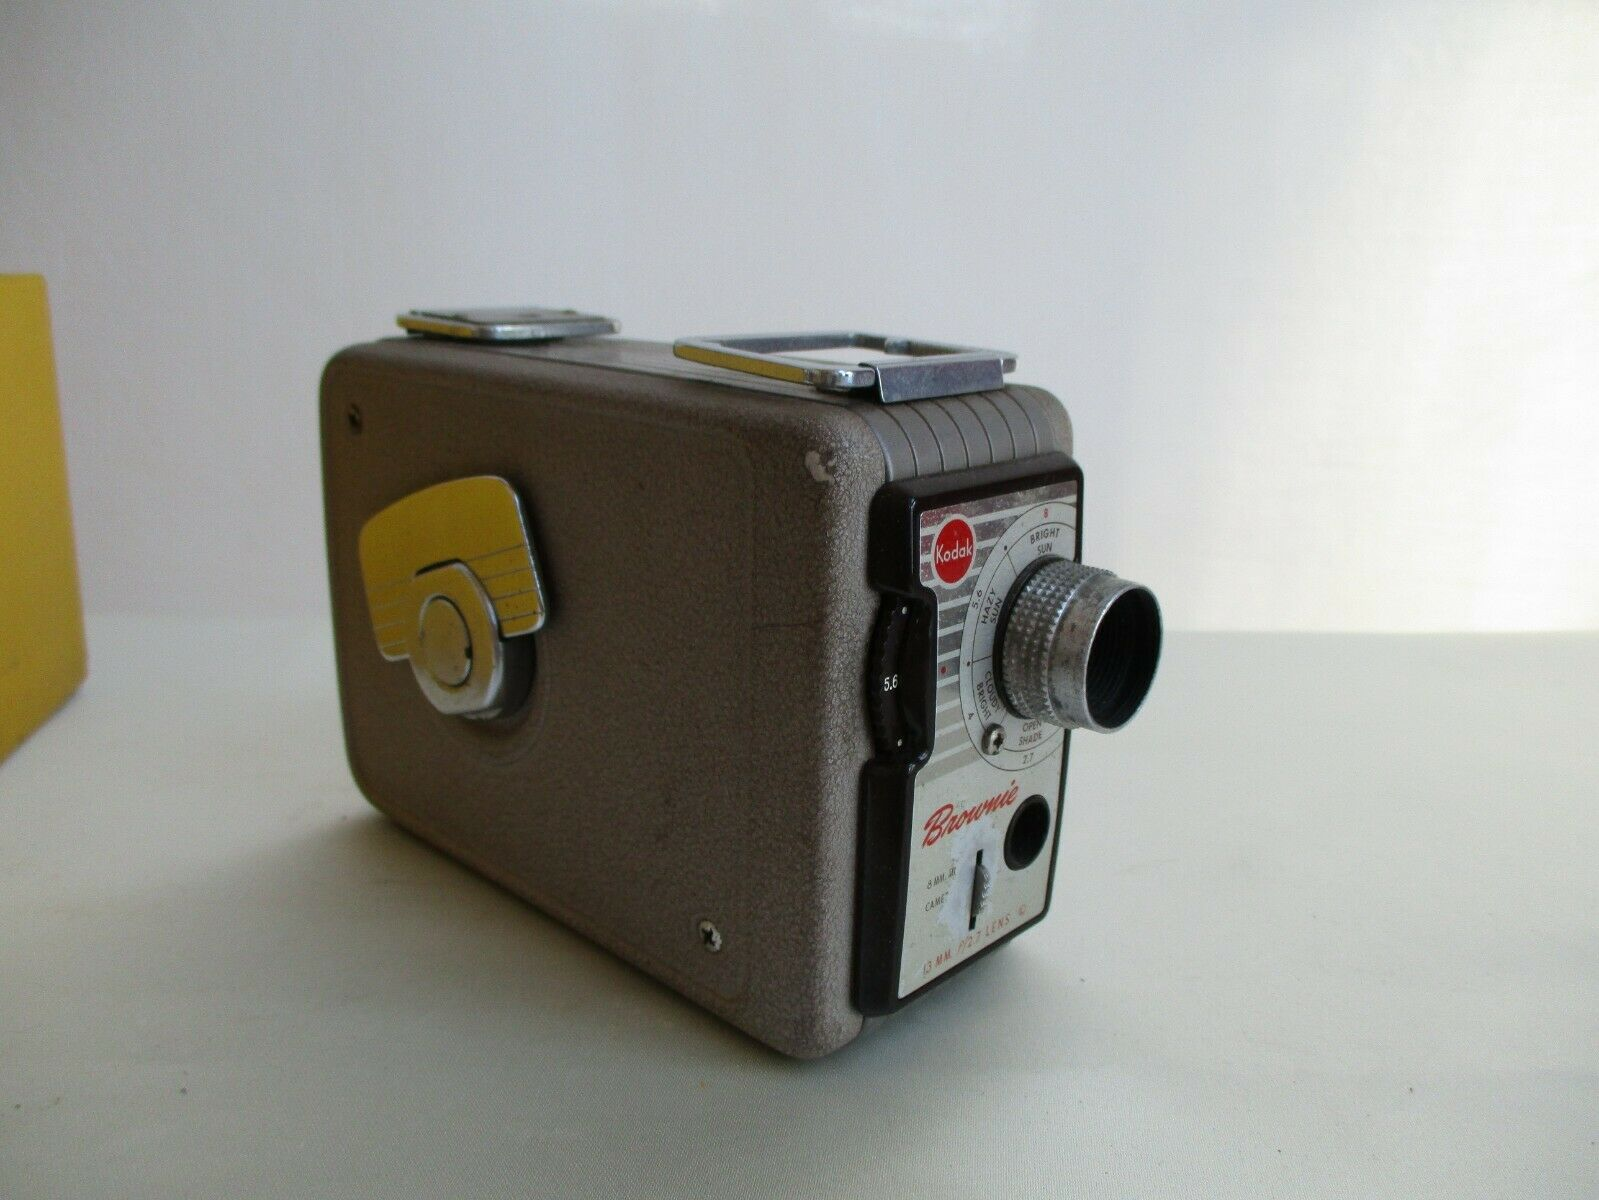 8Mm Vintage Camera vintage kodak brownie movie camera model 2 no. 78 8mm with box